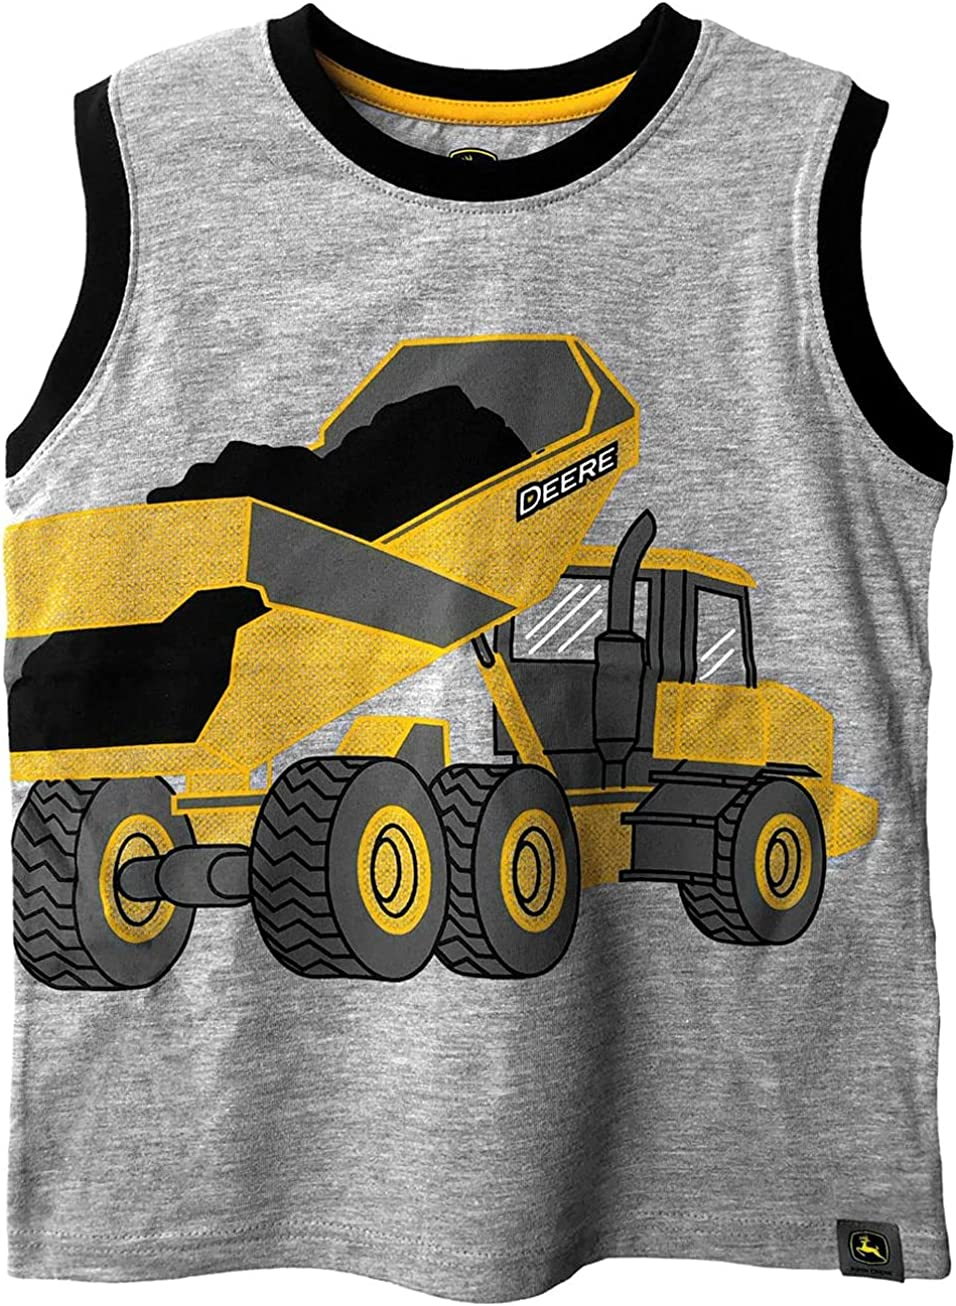 John Deere Gray Sleeveless Dump Truck T-Shirt Sizes 4 5 6 7